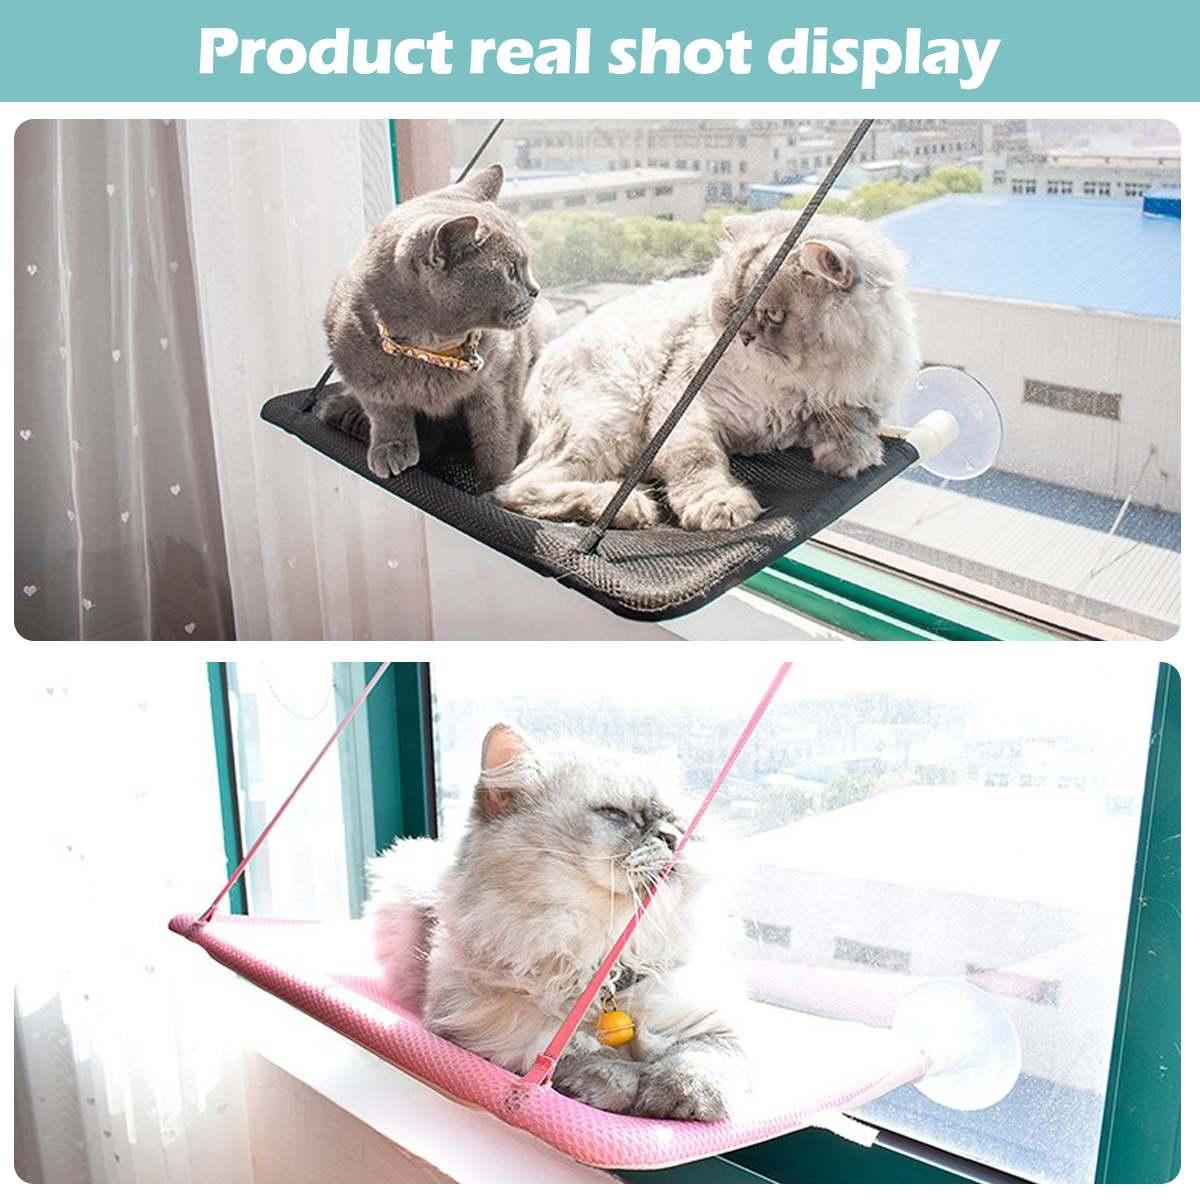 25KG Cat Hammock Window Mounted Cat Hammock Pet Seat Super Suction Cup Hanging Cat Lounger Soft Warm Bed Kitten Supplies Rest